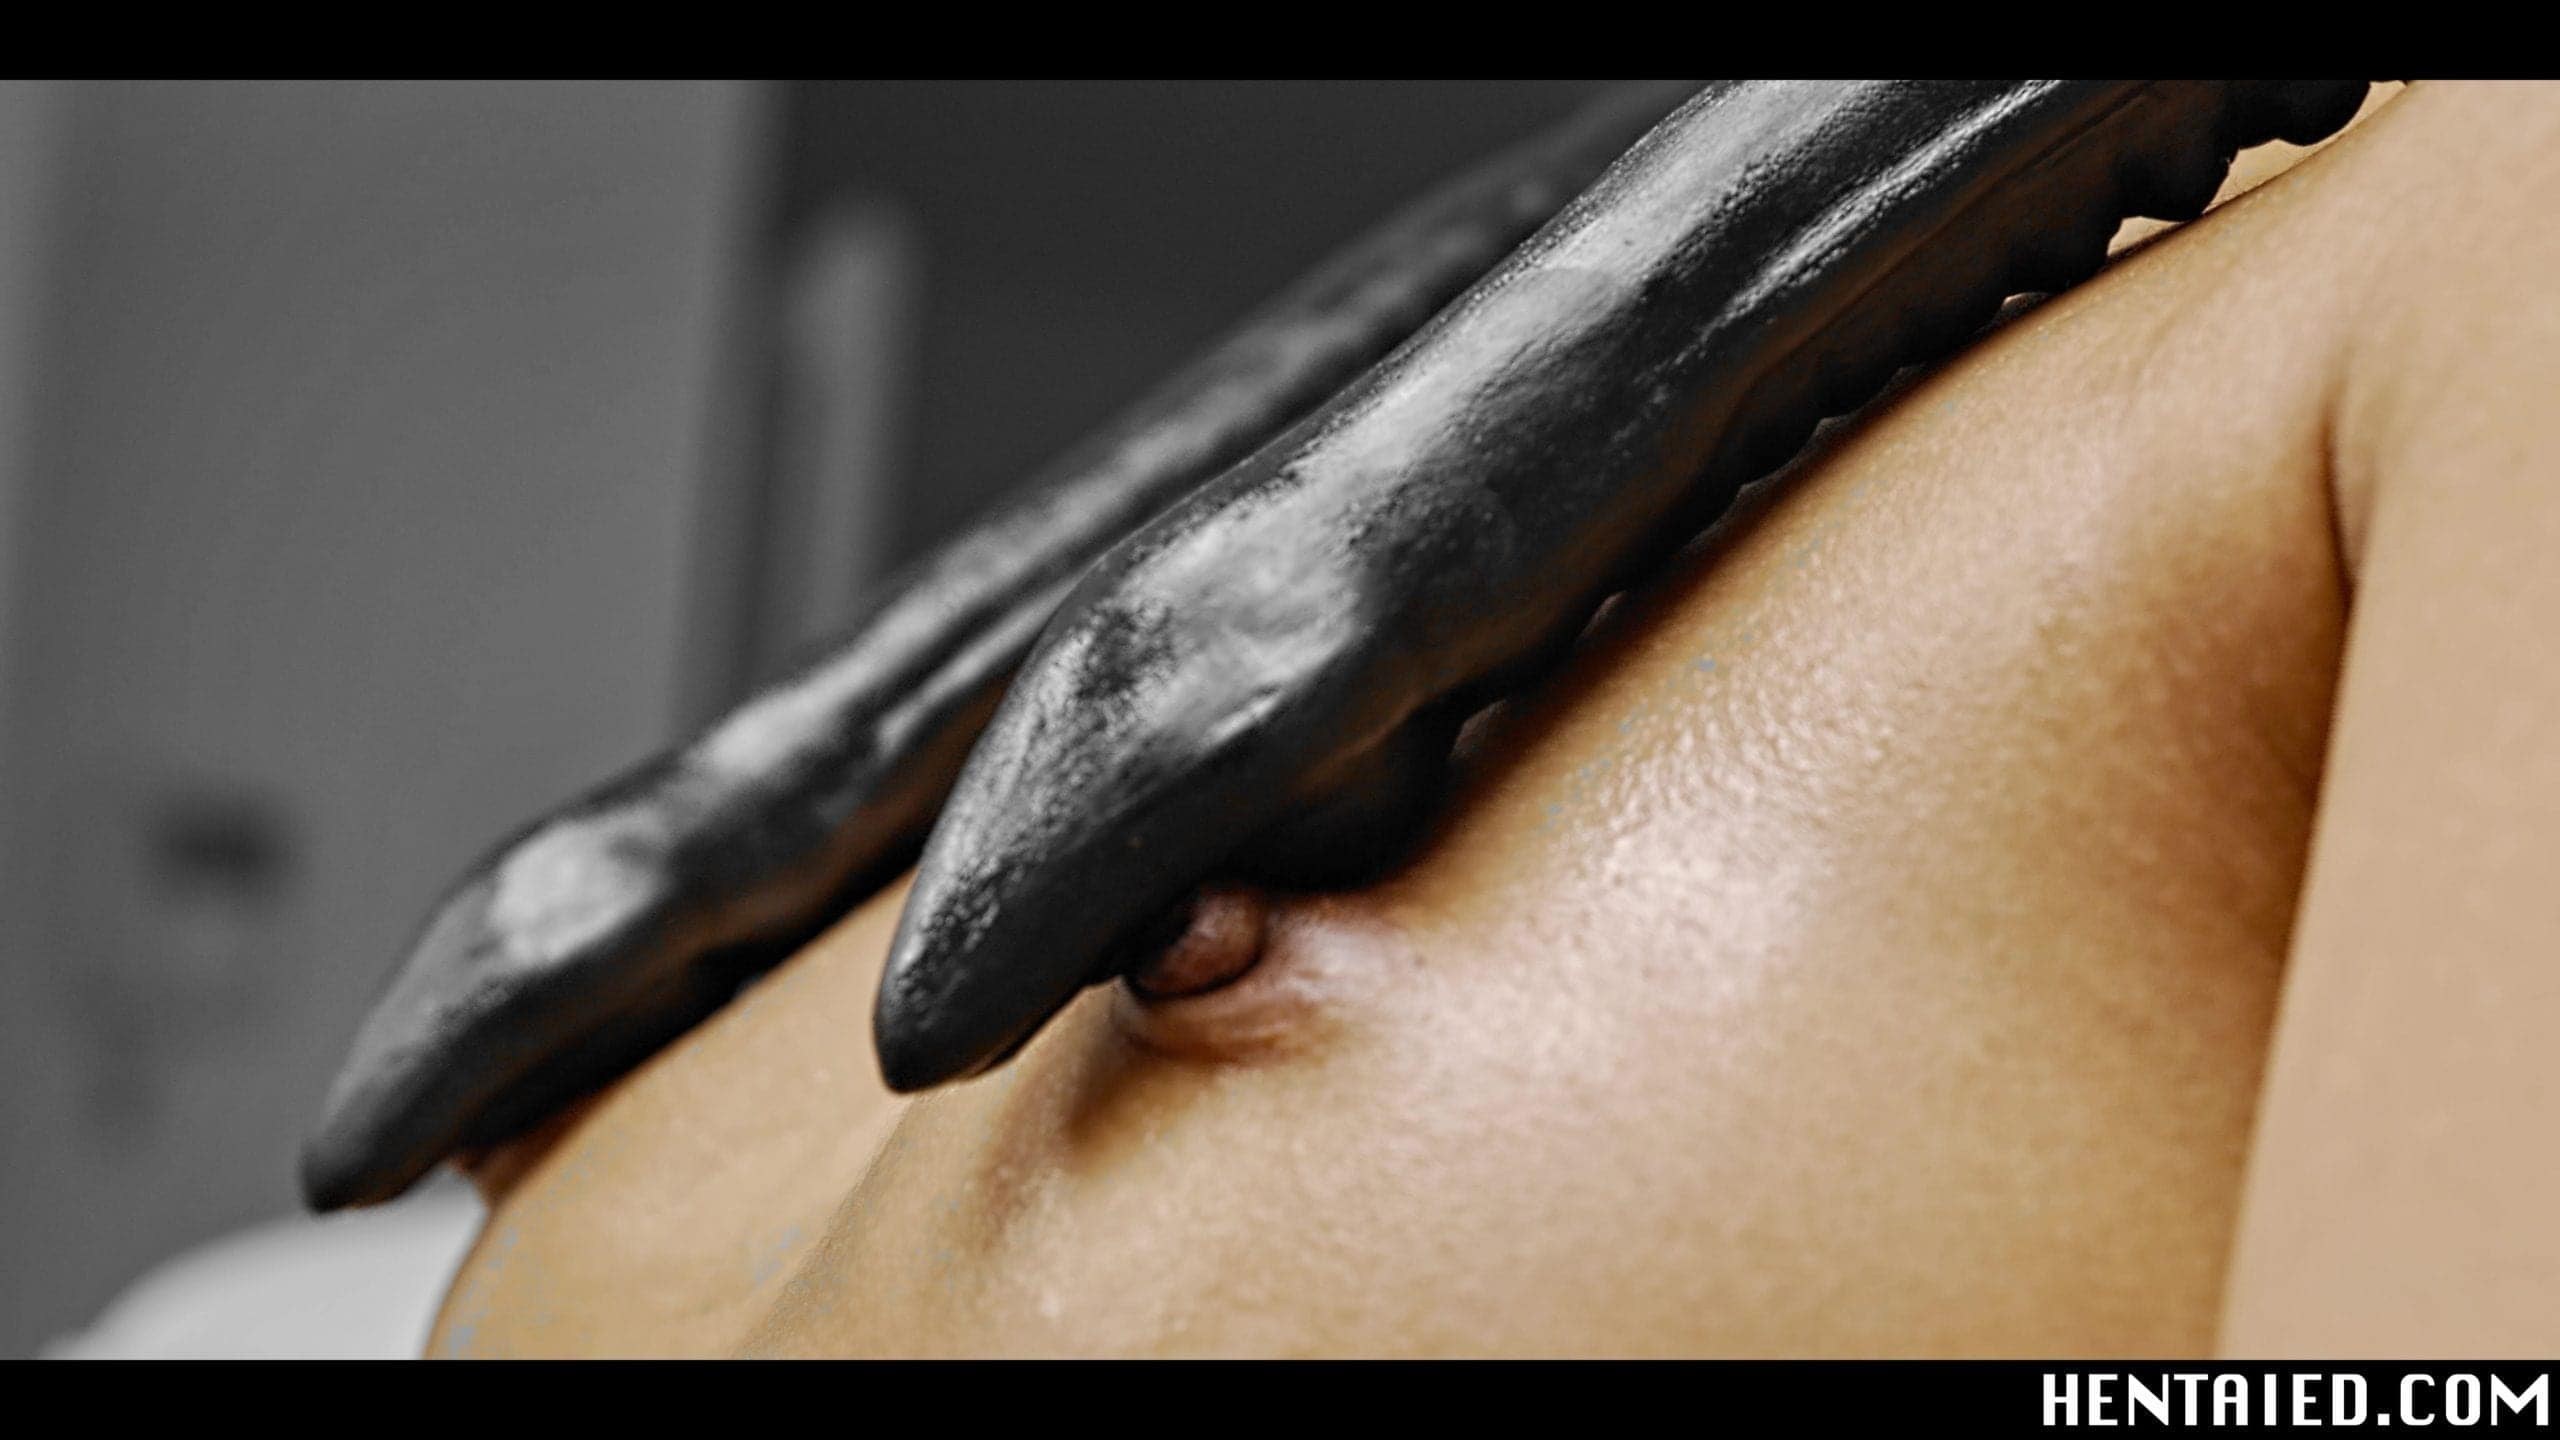 Alien tentacles touching nipples